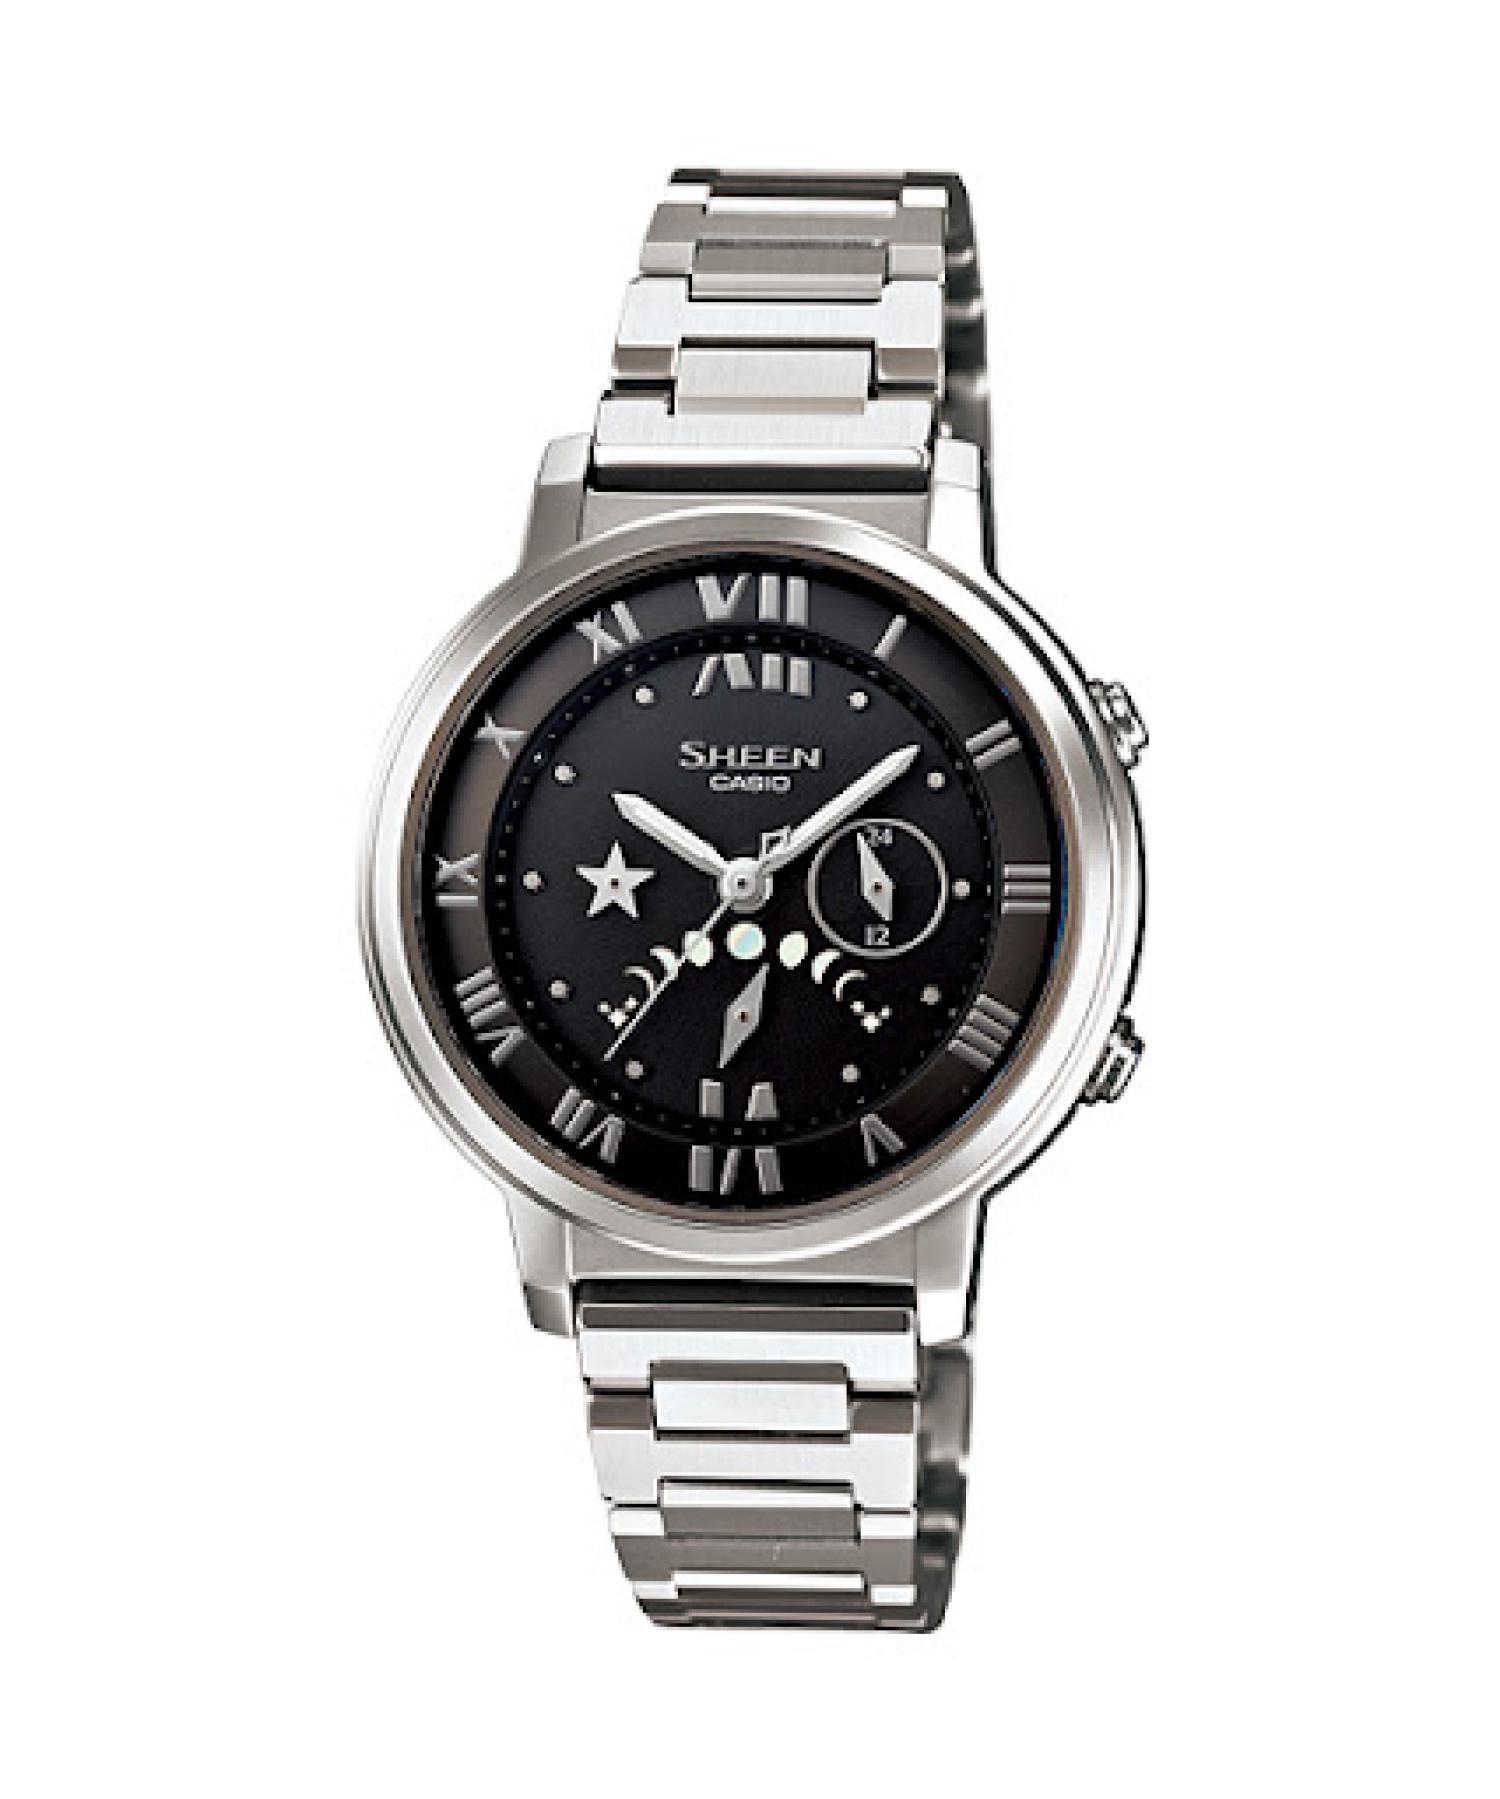 Casio Men's Sheen SHE3501SBD-1A Silver Stainless-Steel Quartz Fashion Watch